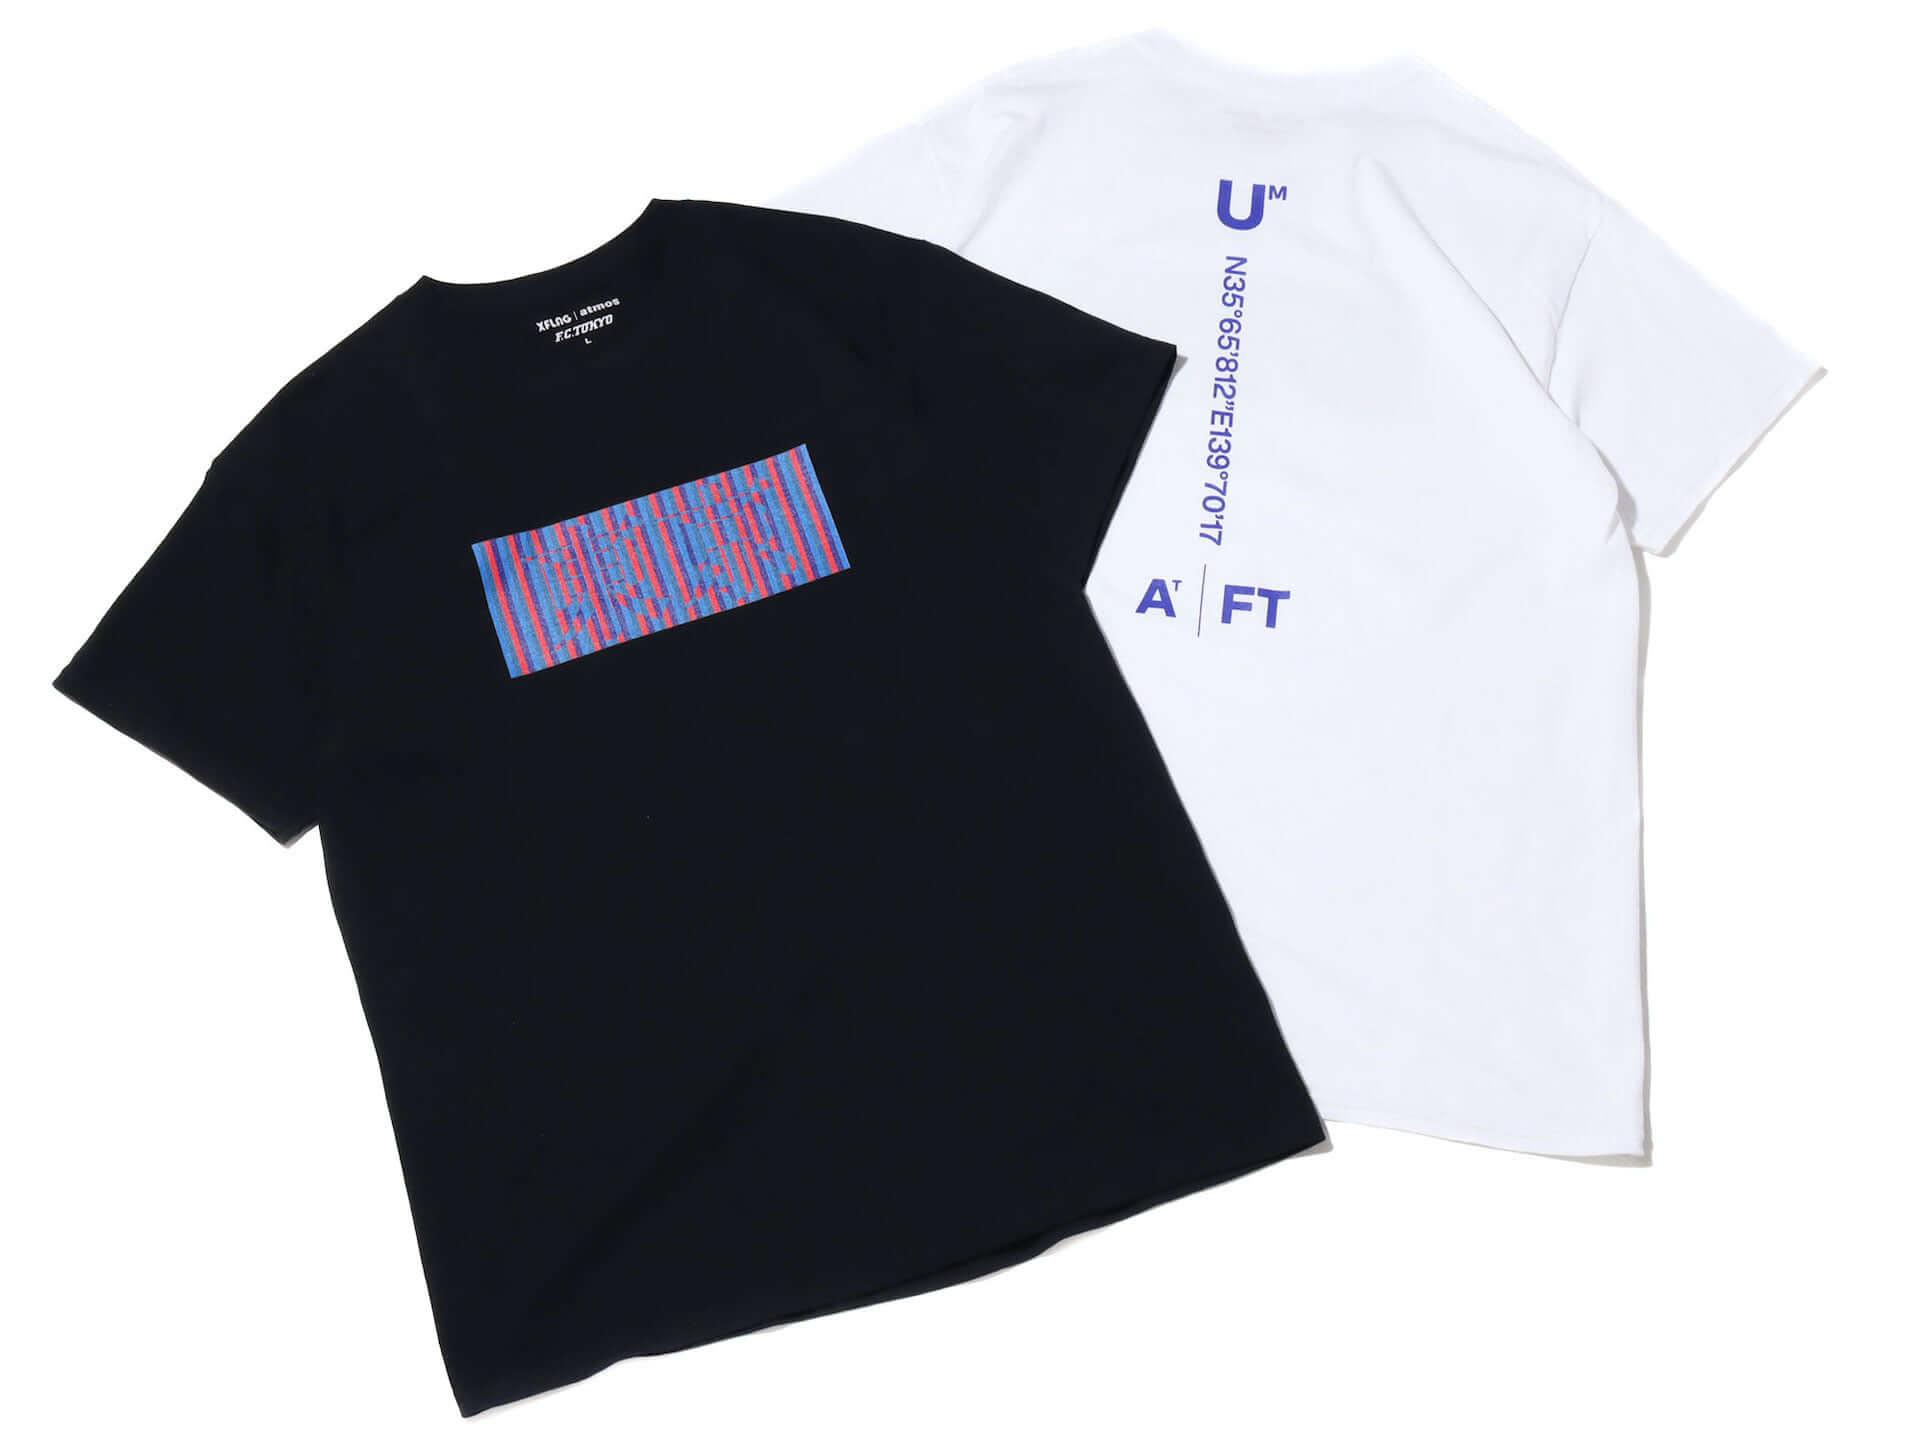 XFLAGが新プロジェクト「XFLAG LAB」を始動!FC東京×atmos×umbroのコラボスニーカー&Tシャツが発売決定 lf200804_xflag_6-1920x1446